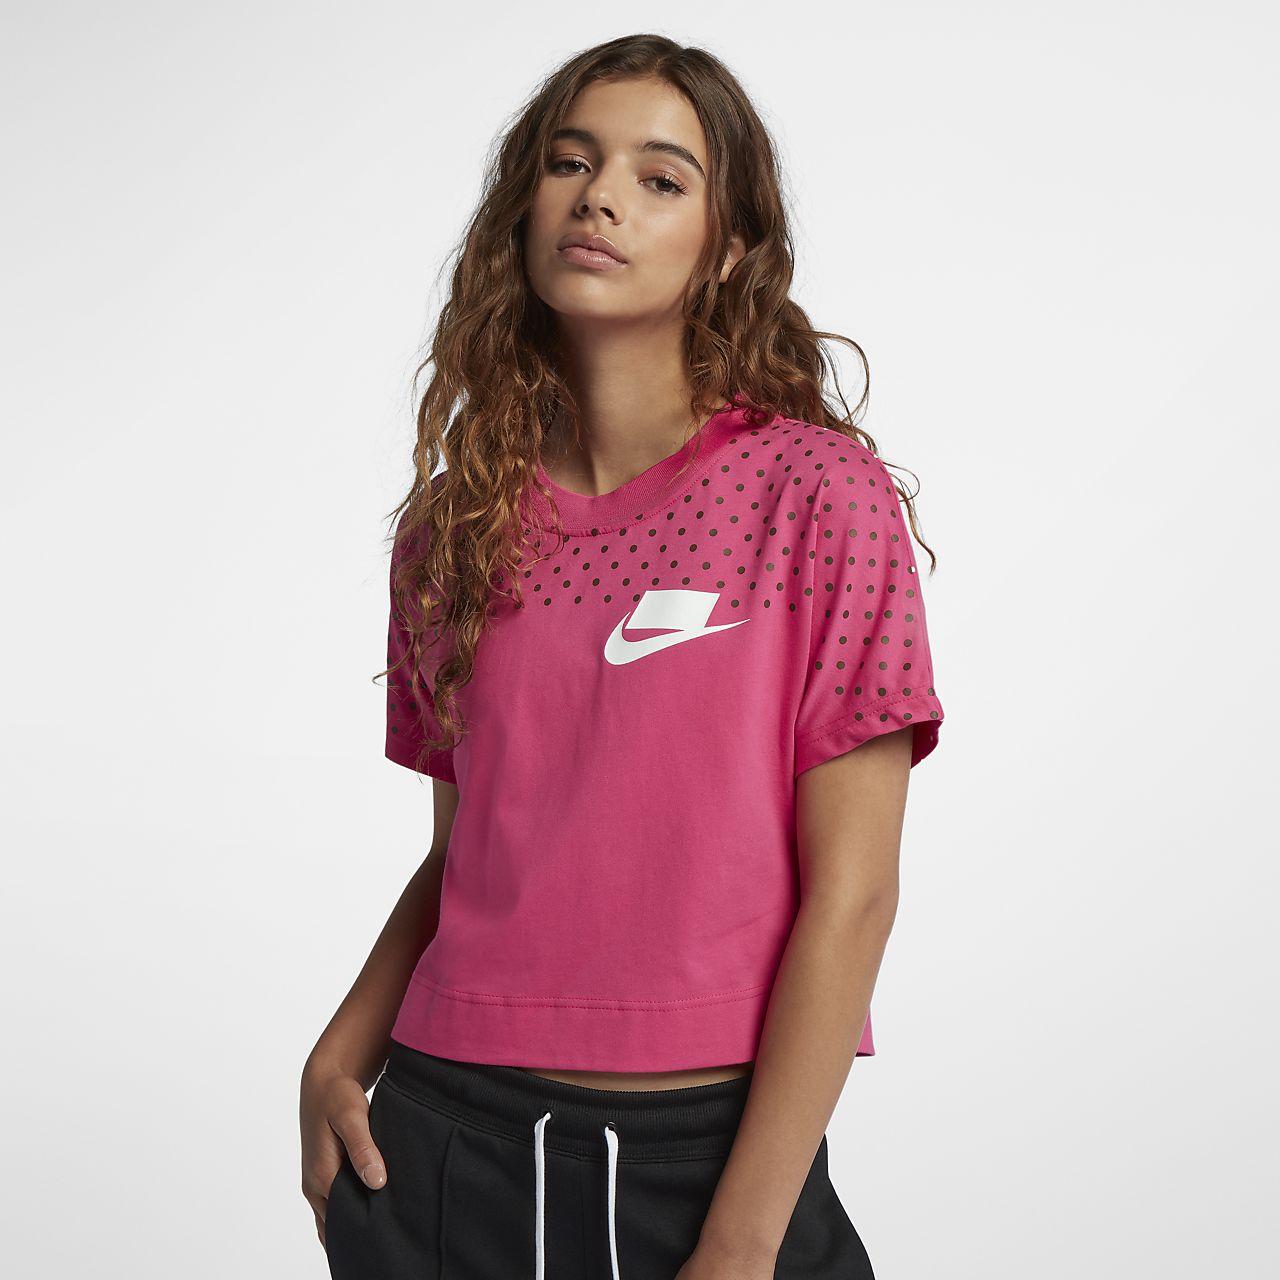 Nike Air magetopp for dame